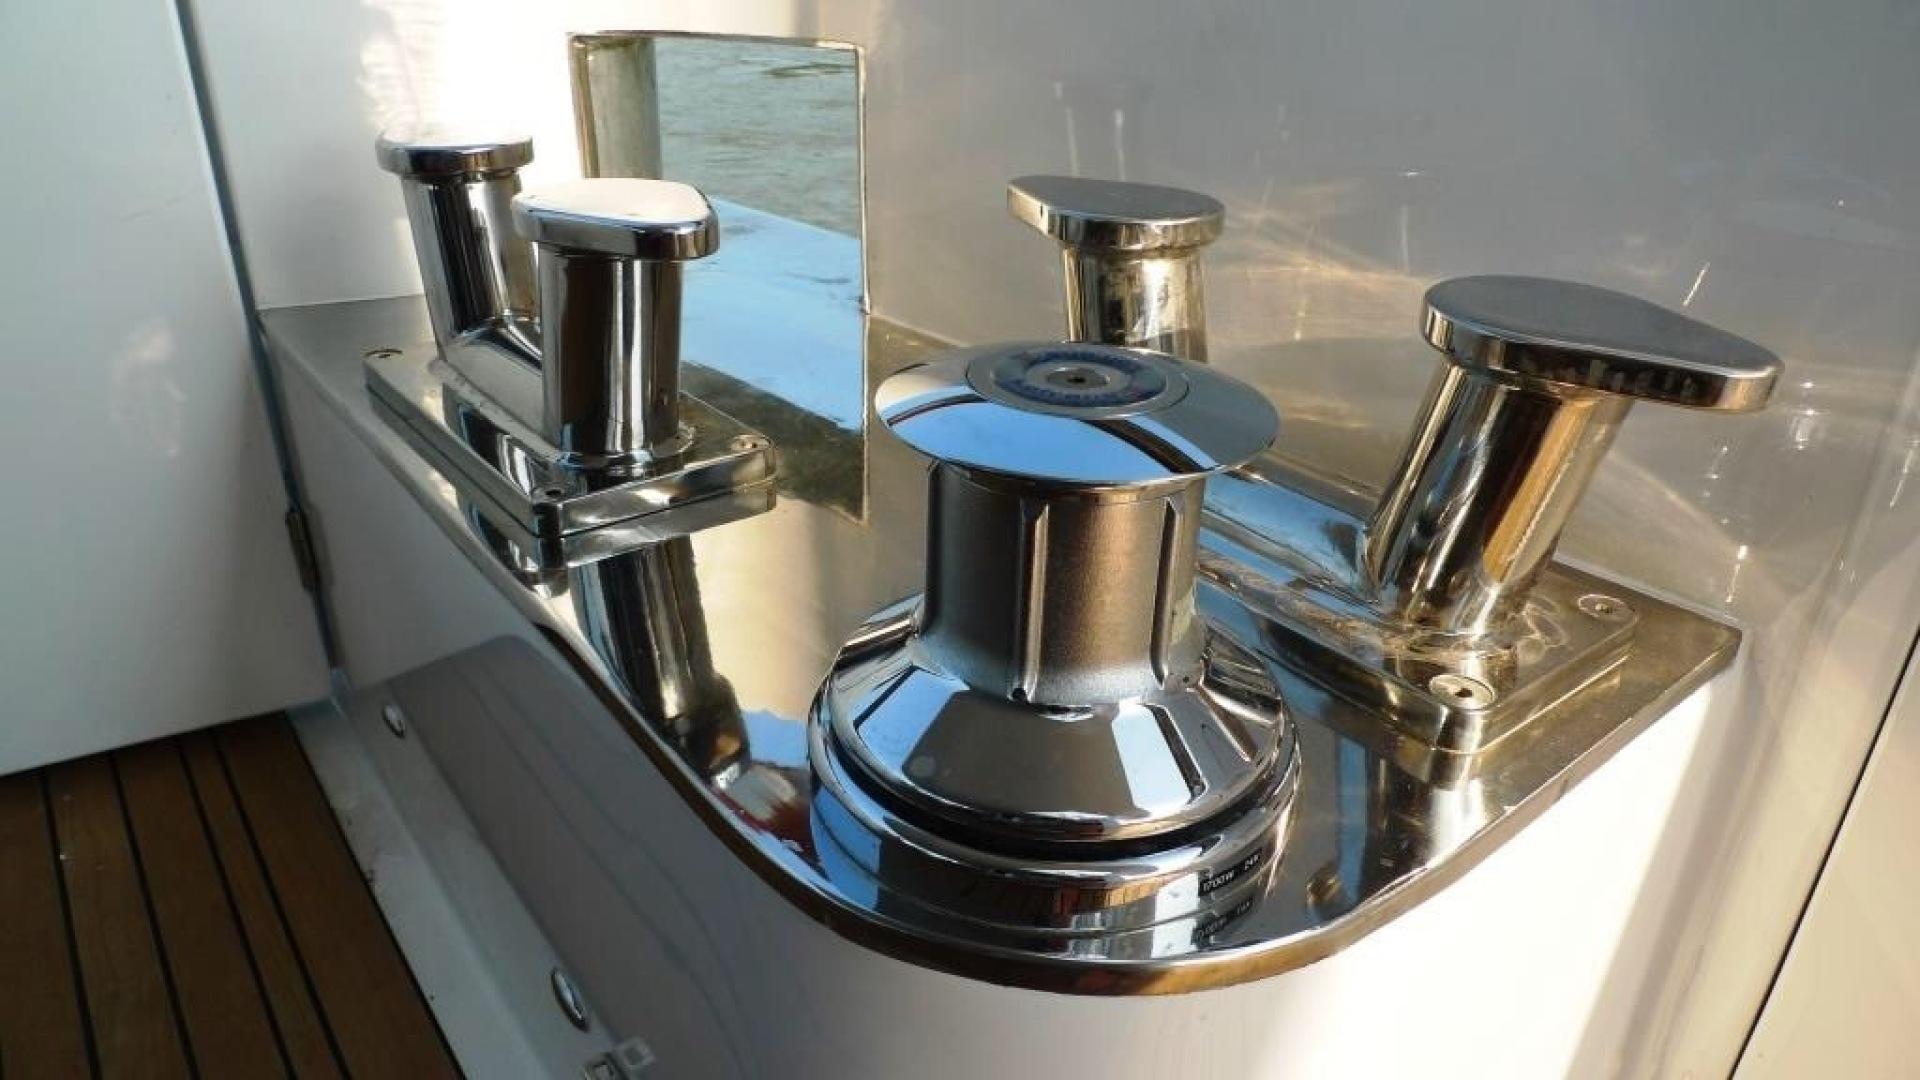 Bering-65 Bering Yacht 2013-Namaste Dania-Florida-United States-1401075   Thumbnail